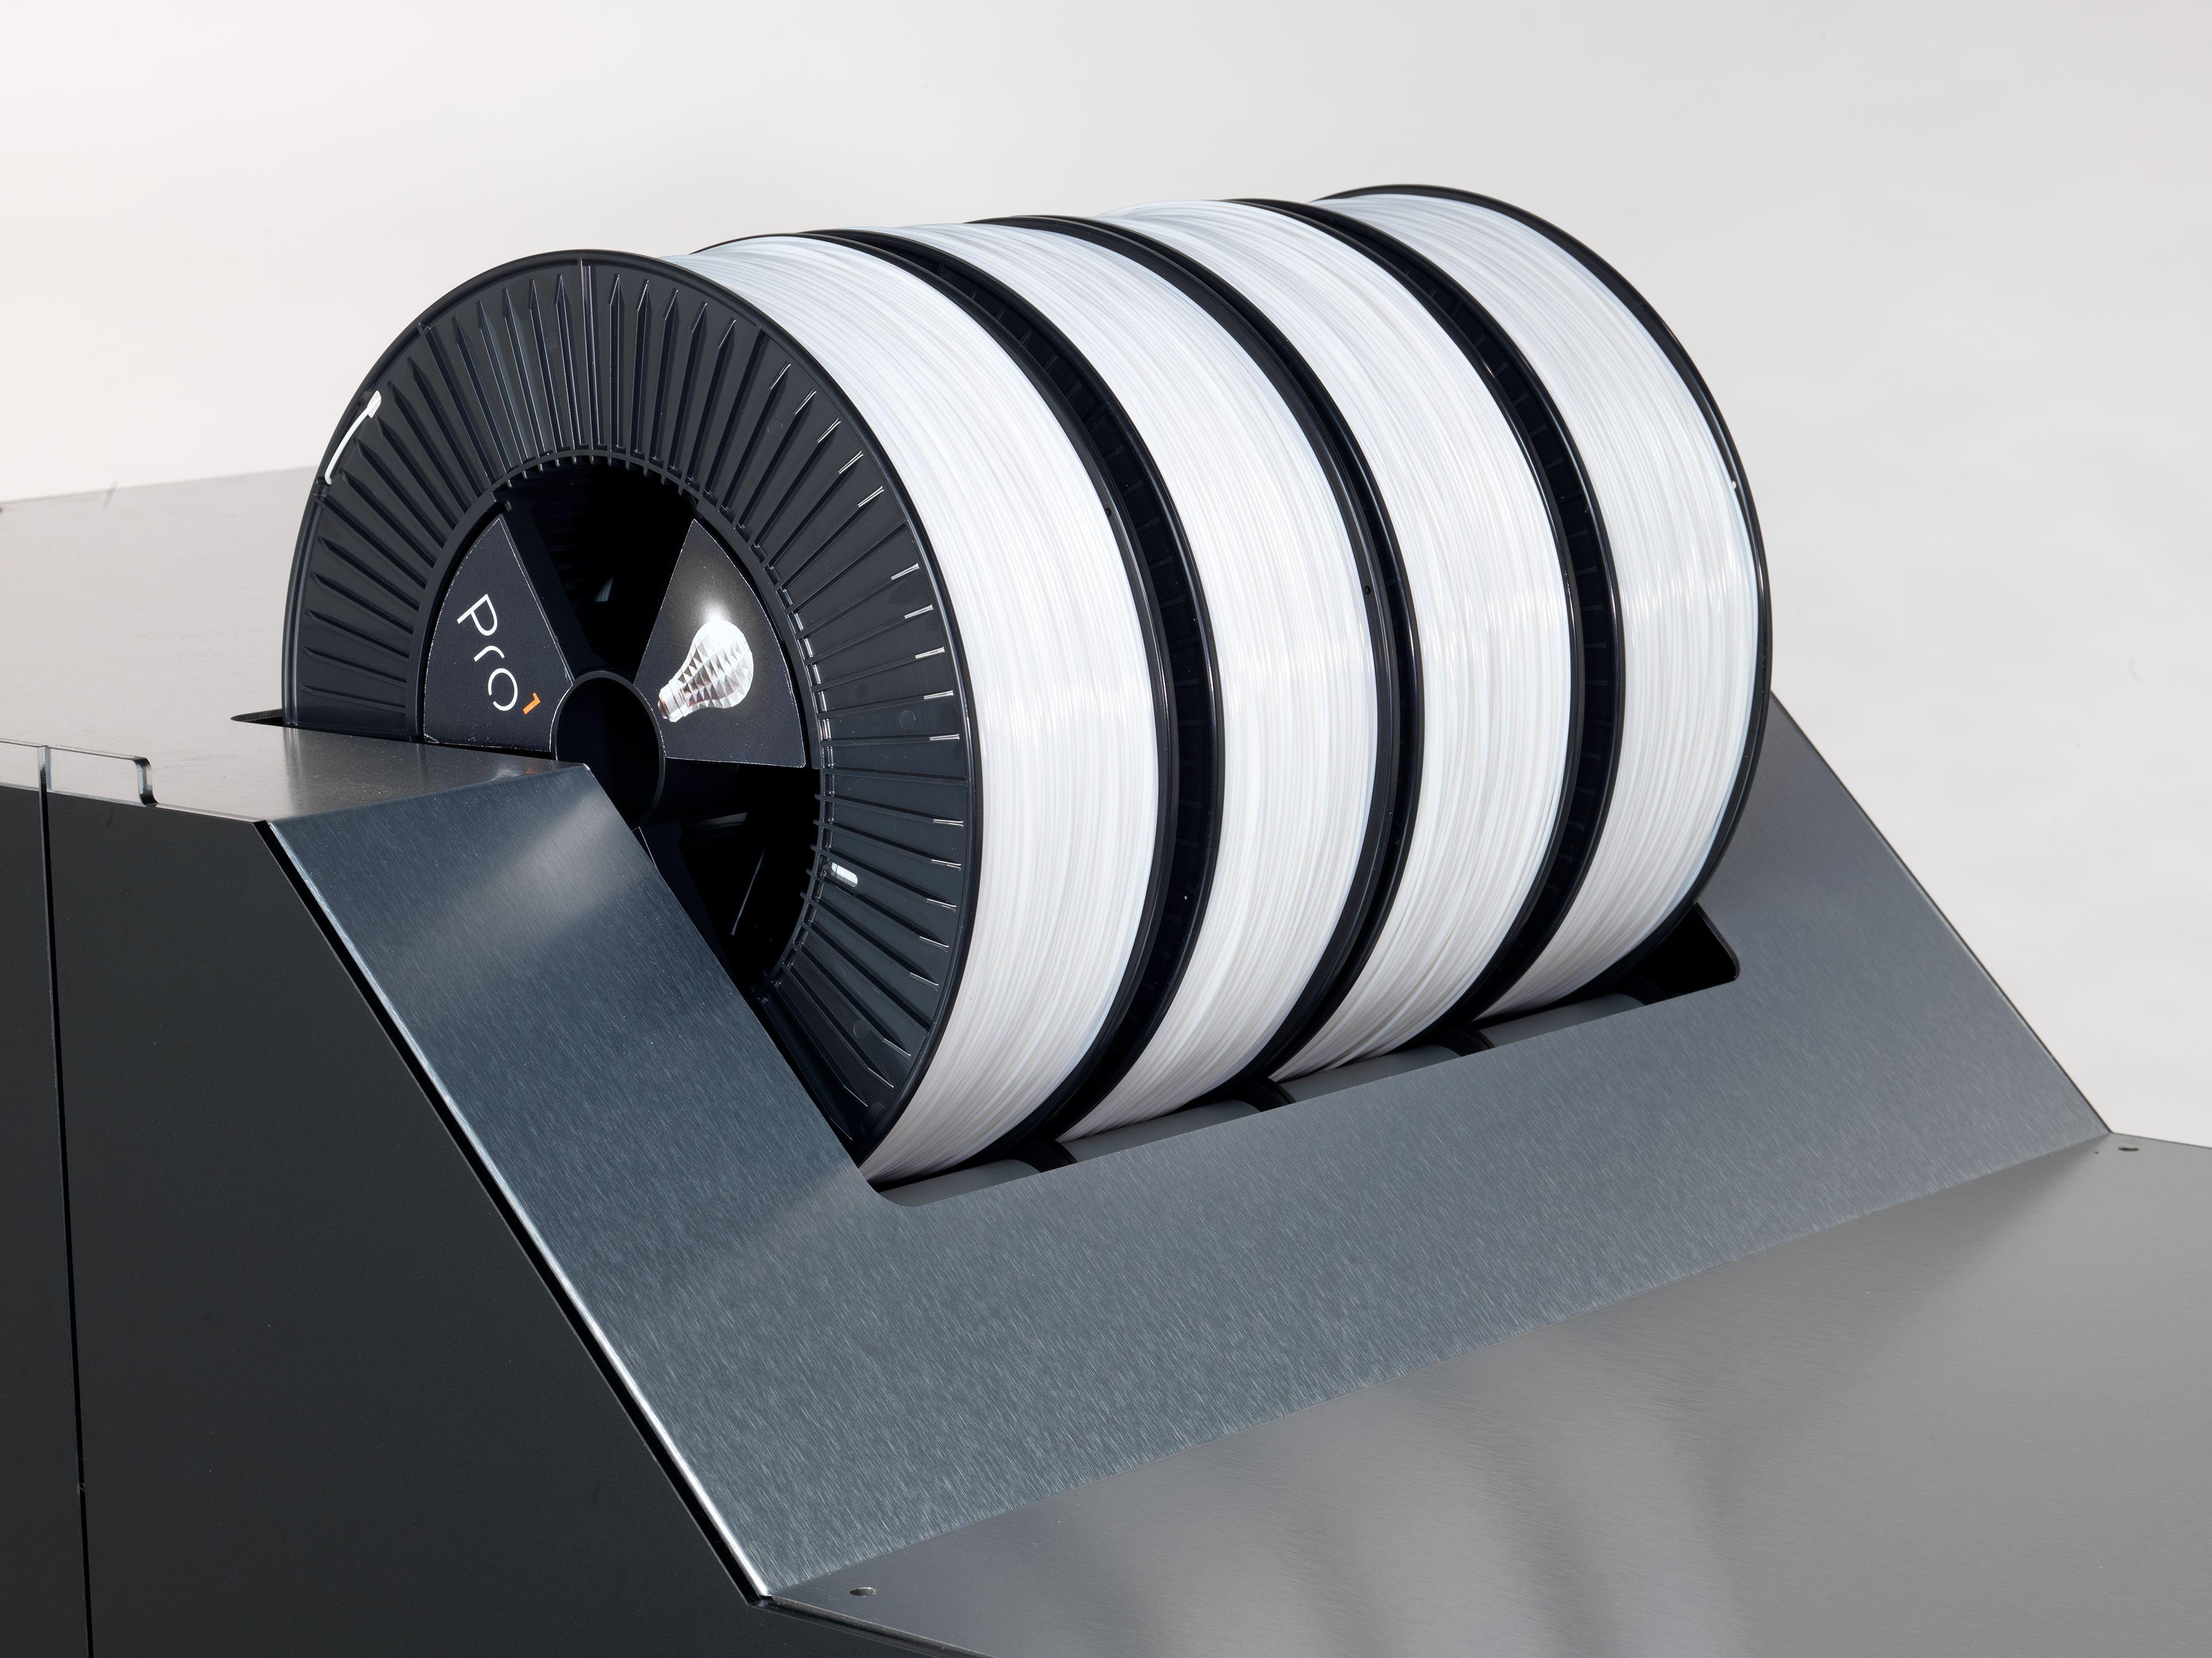 filament-builder-extreme-1500